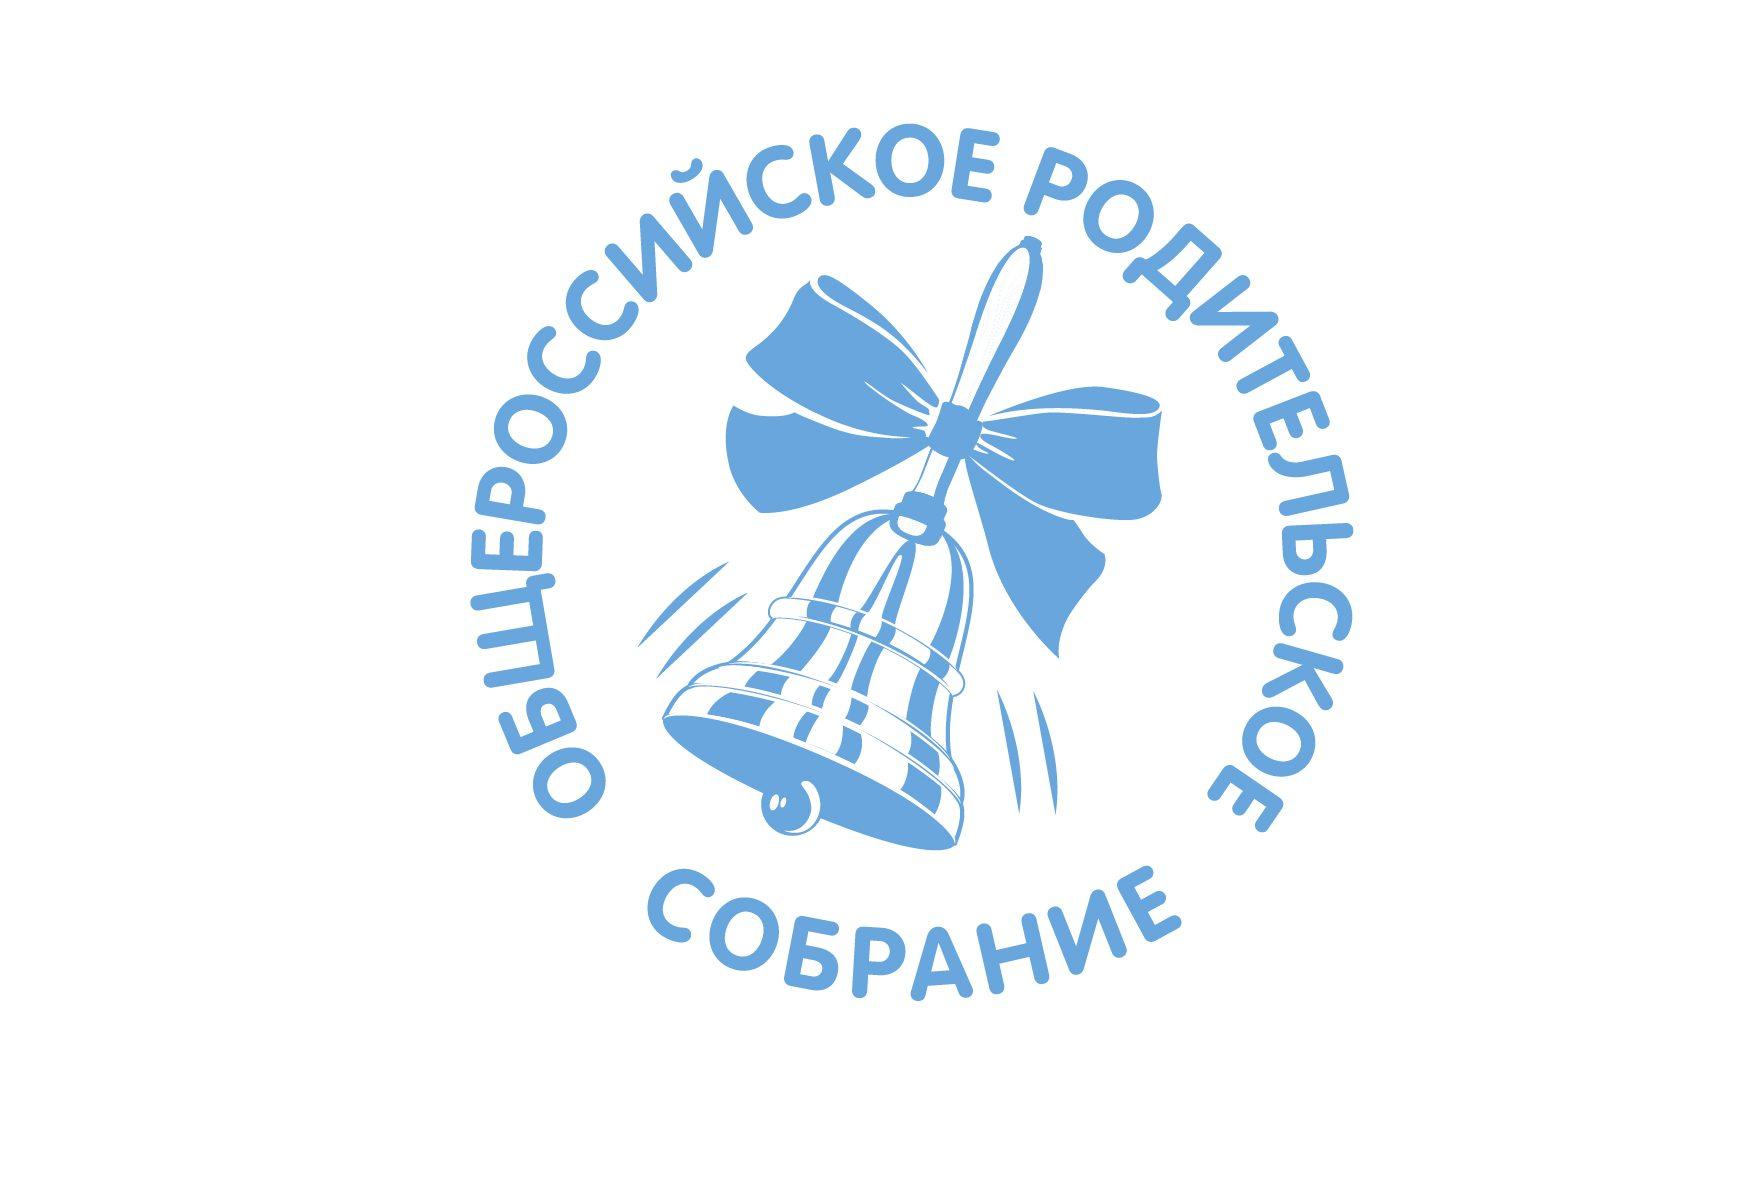 obshherossijskoe-roditelskoe-sobranie-projdet-v-konce-avgusta